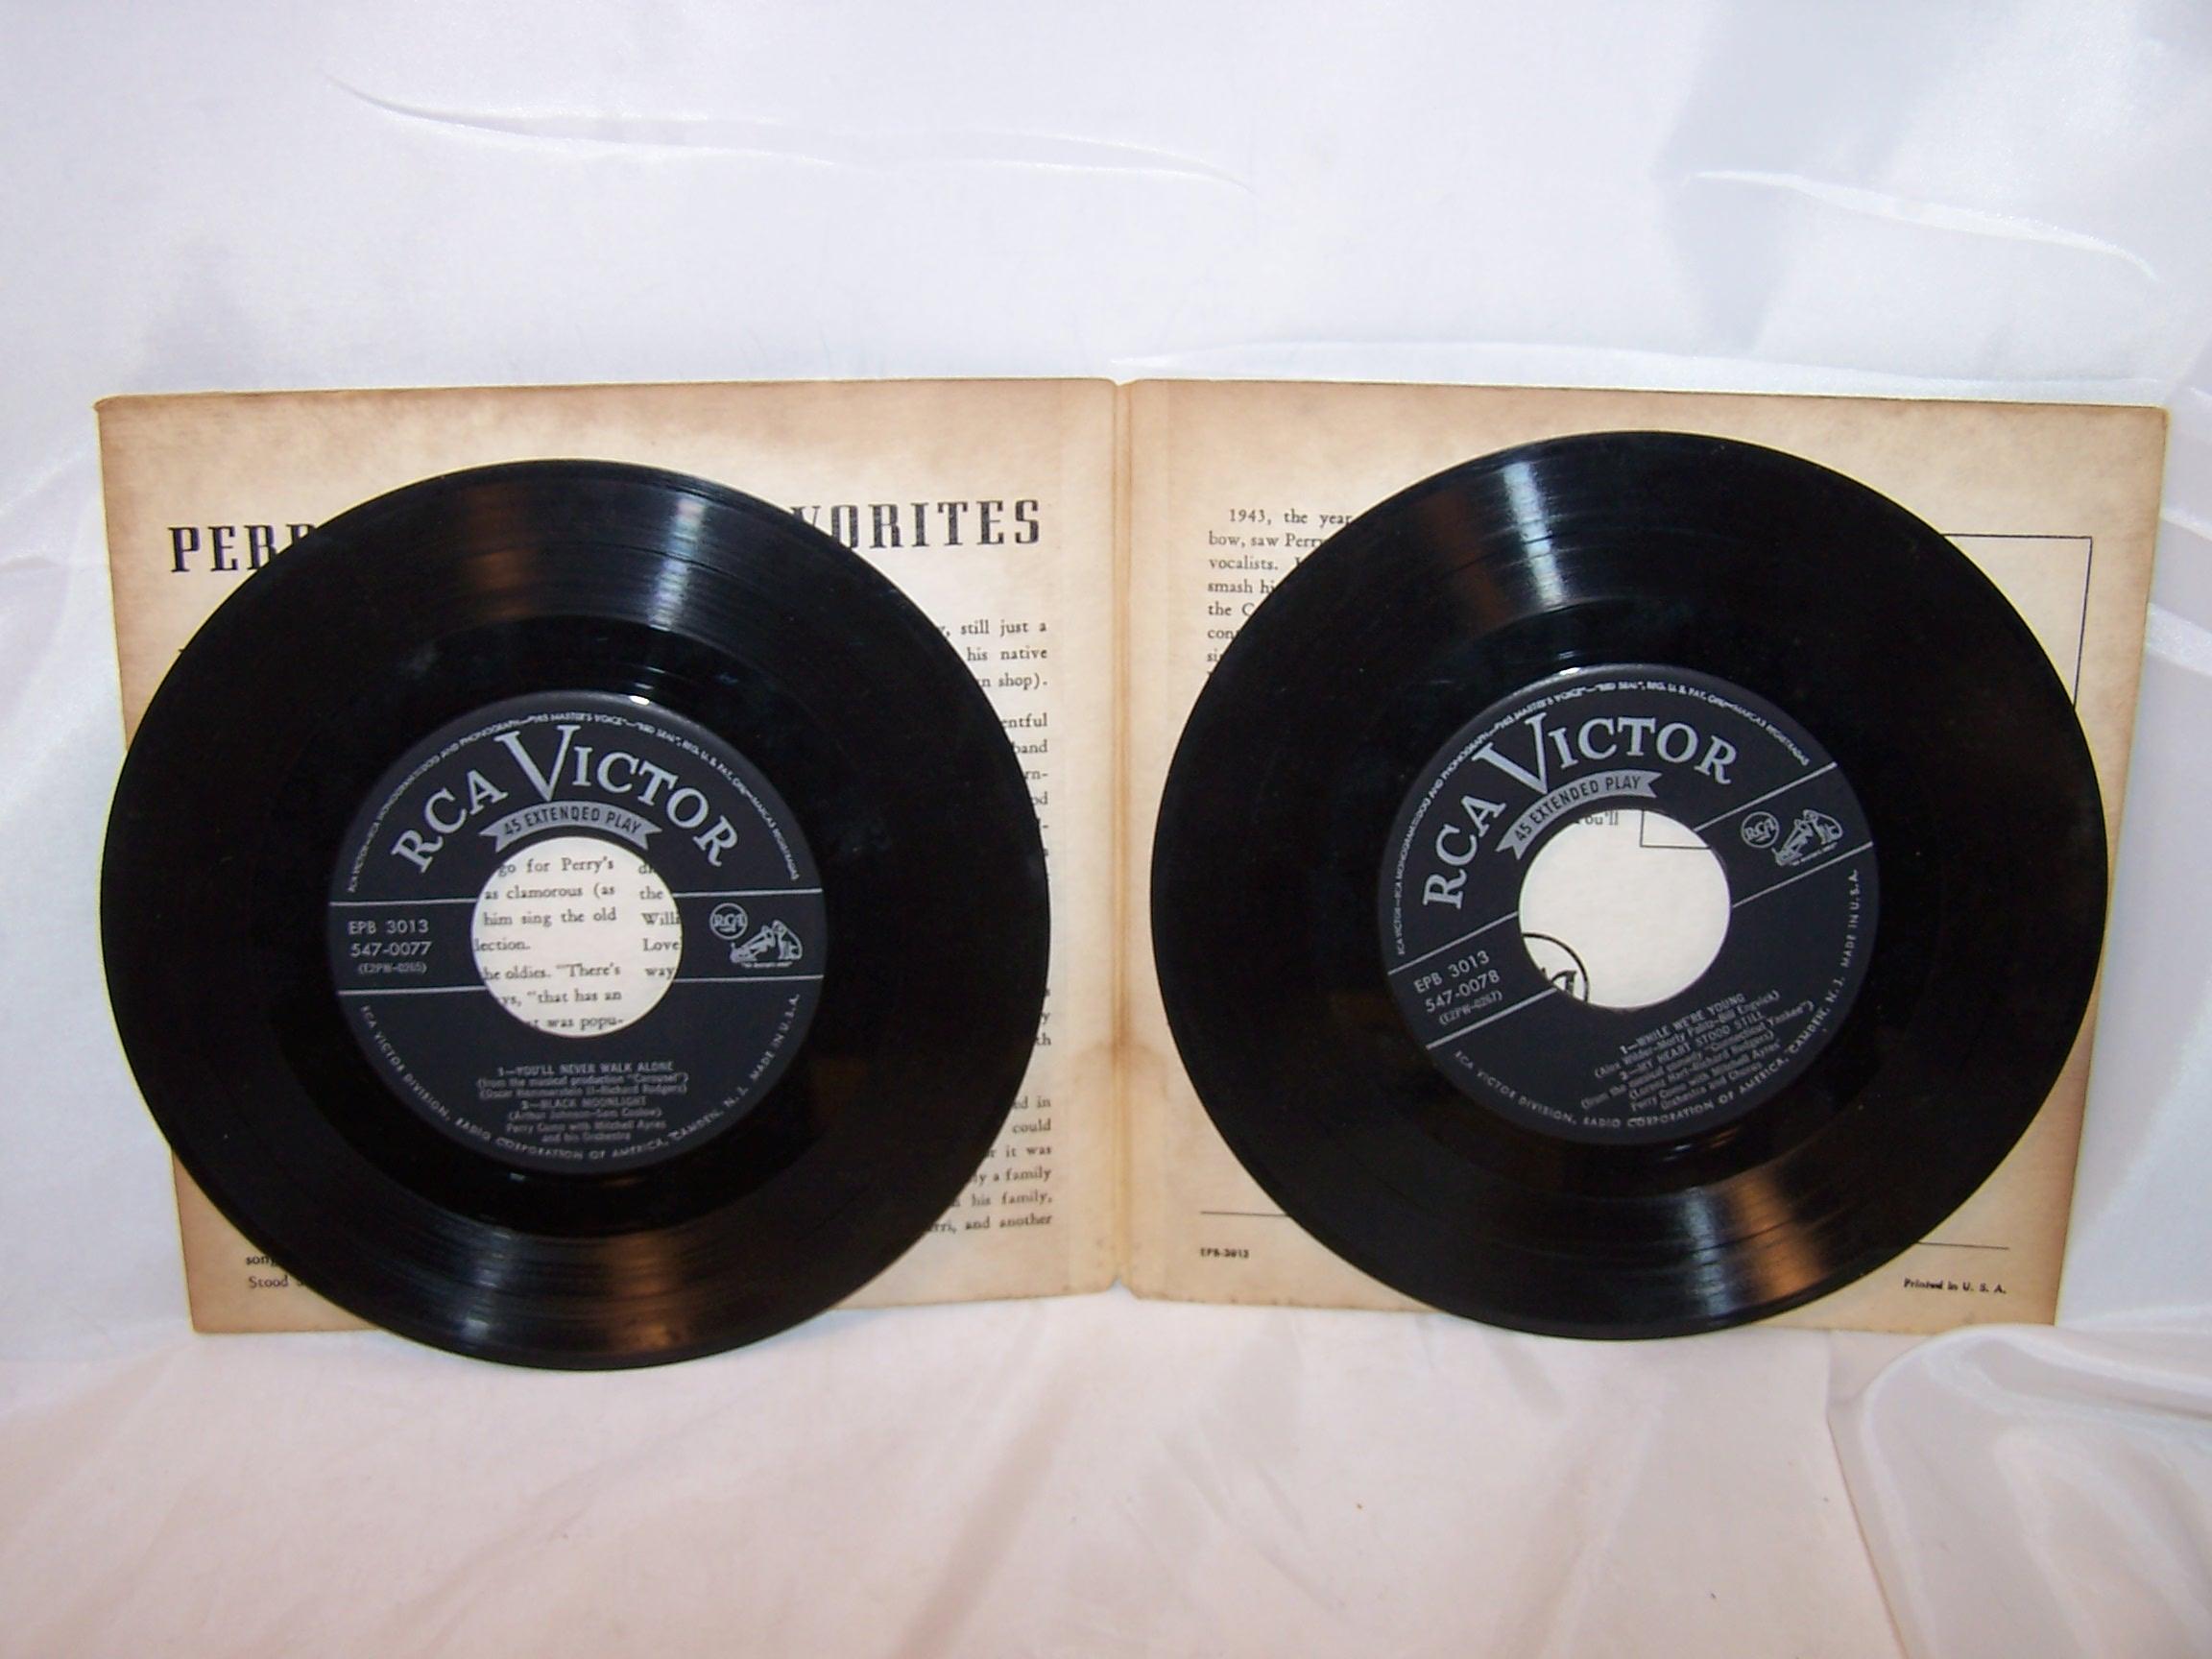 Image 3 of Perry Como, TV Favorites 45 RPM Record Set